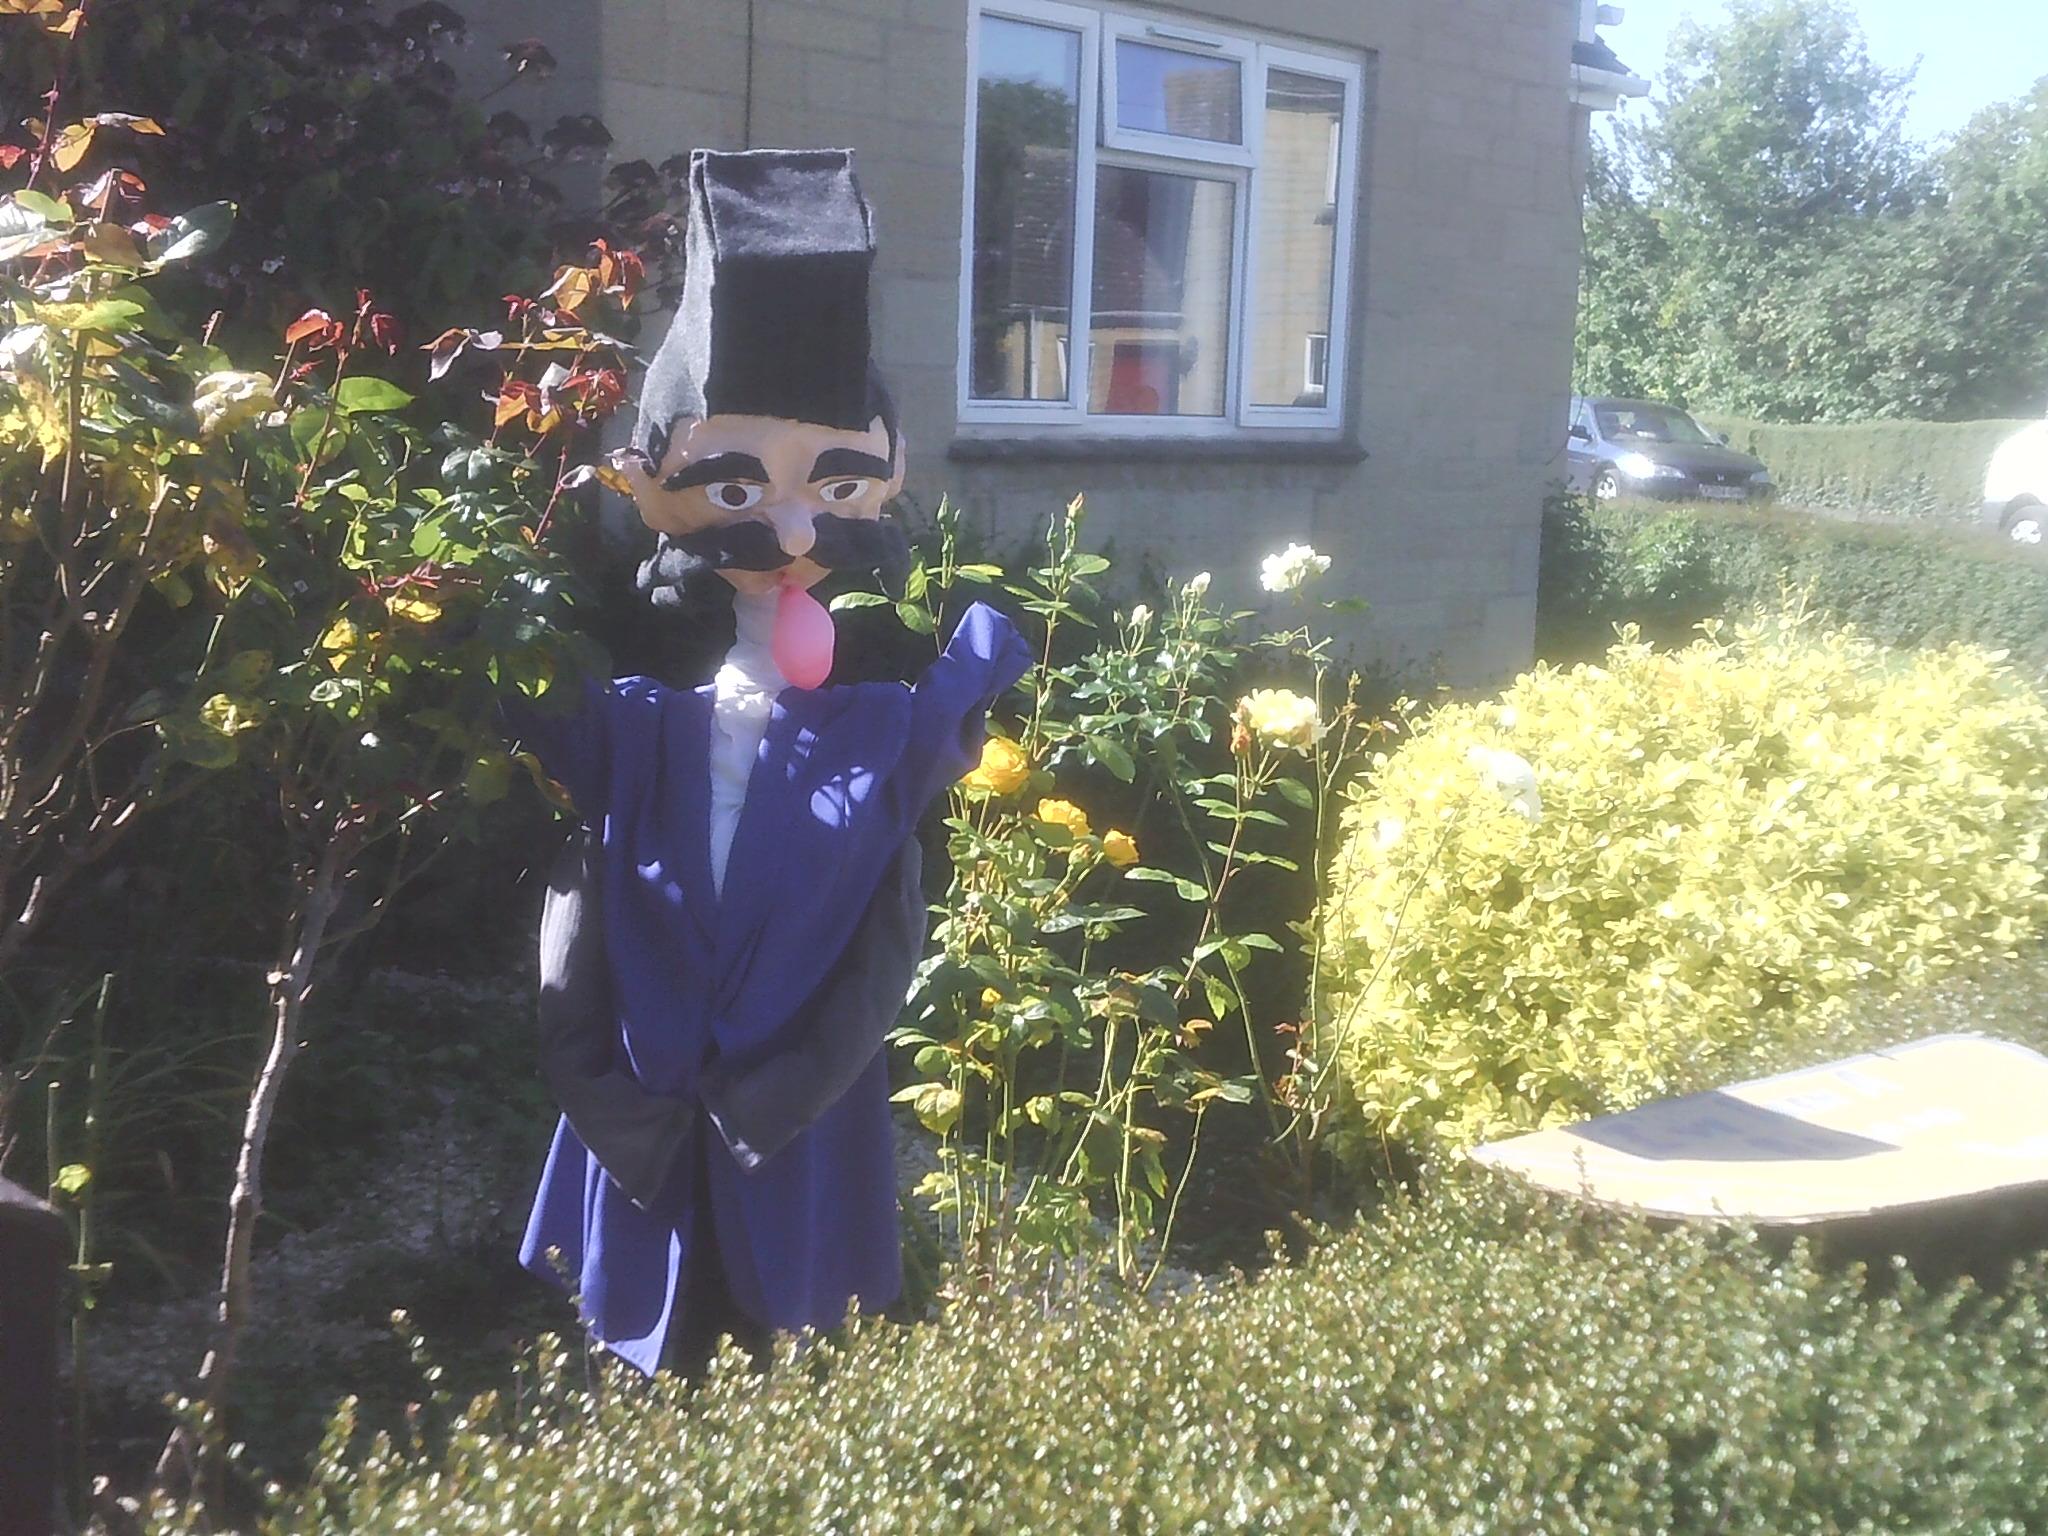 Balthazar Brat Scarecrow